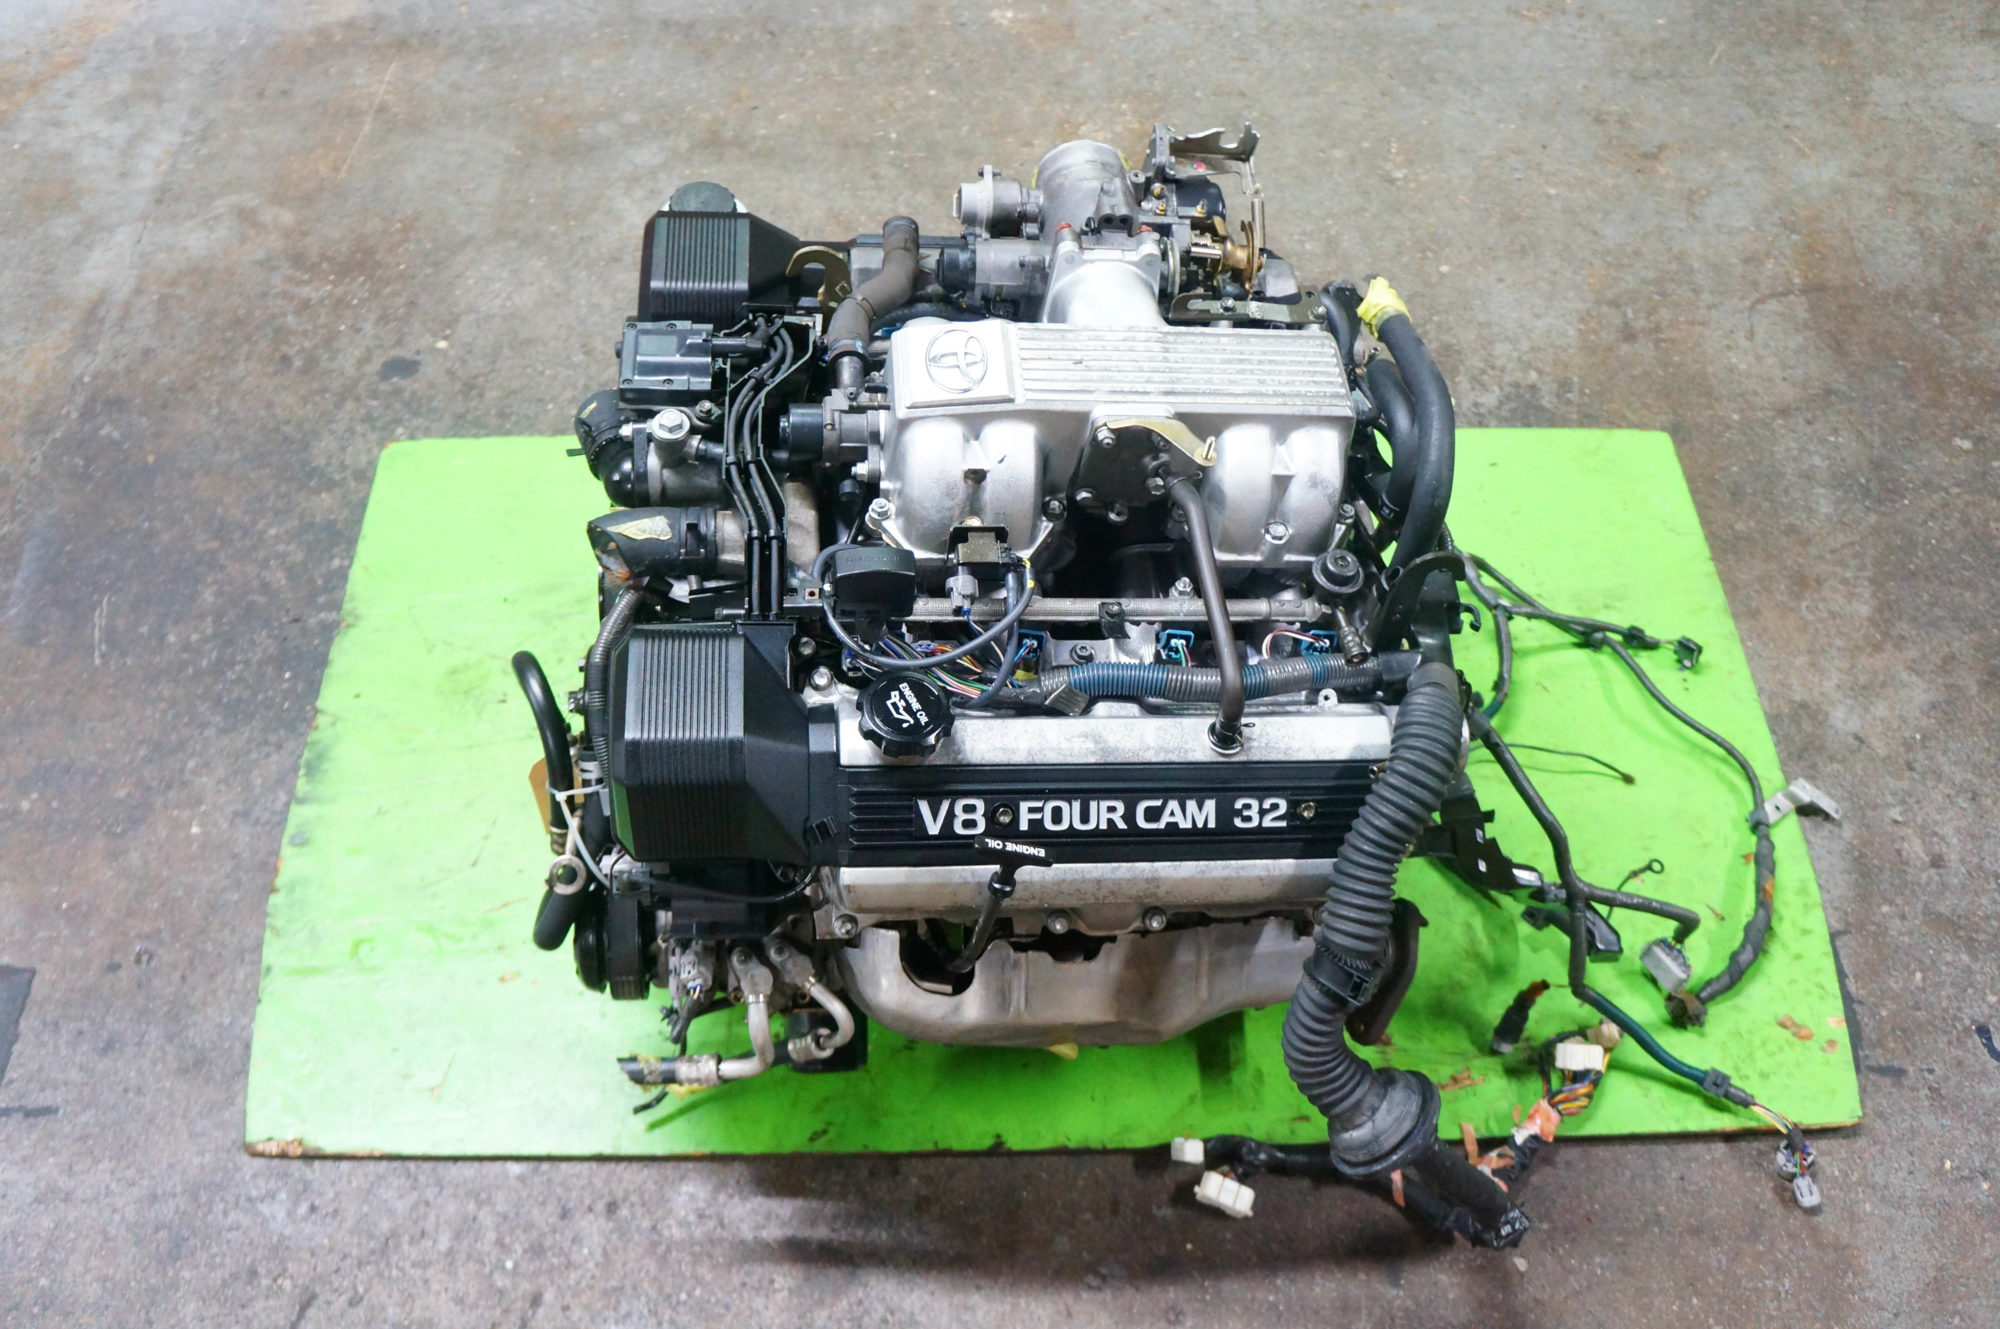 JDM 1UZ-FE 98-05 LEXUS GS400 SC400 LS400 1UZ-FE ENGINE 4.0L NON VVTi